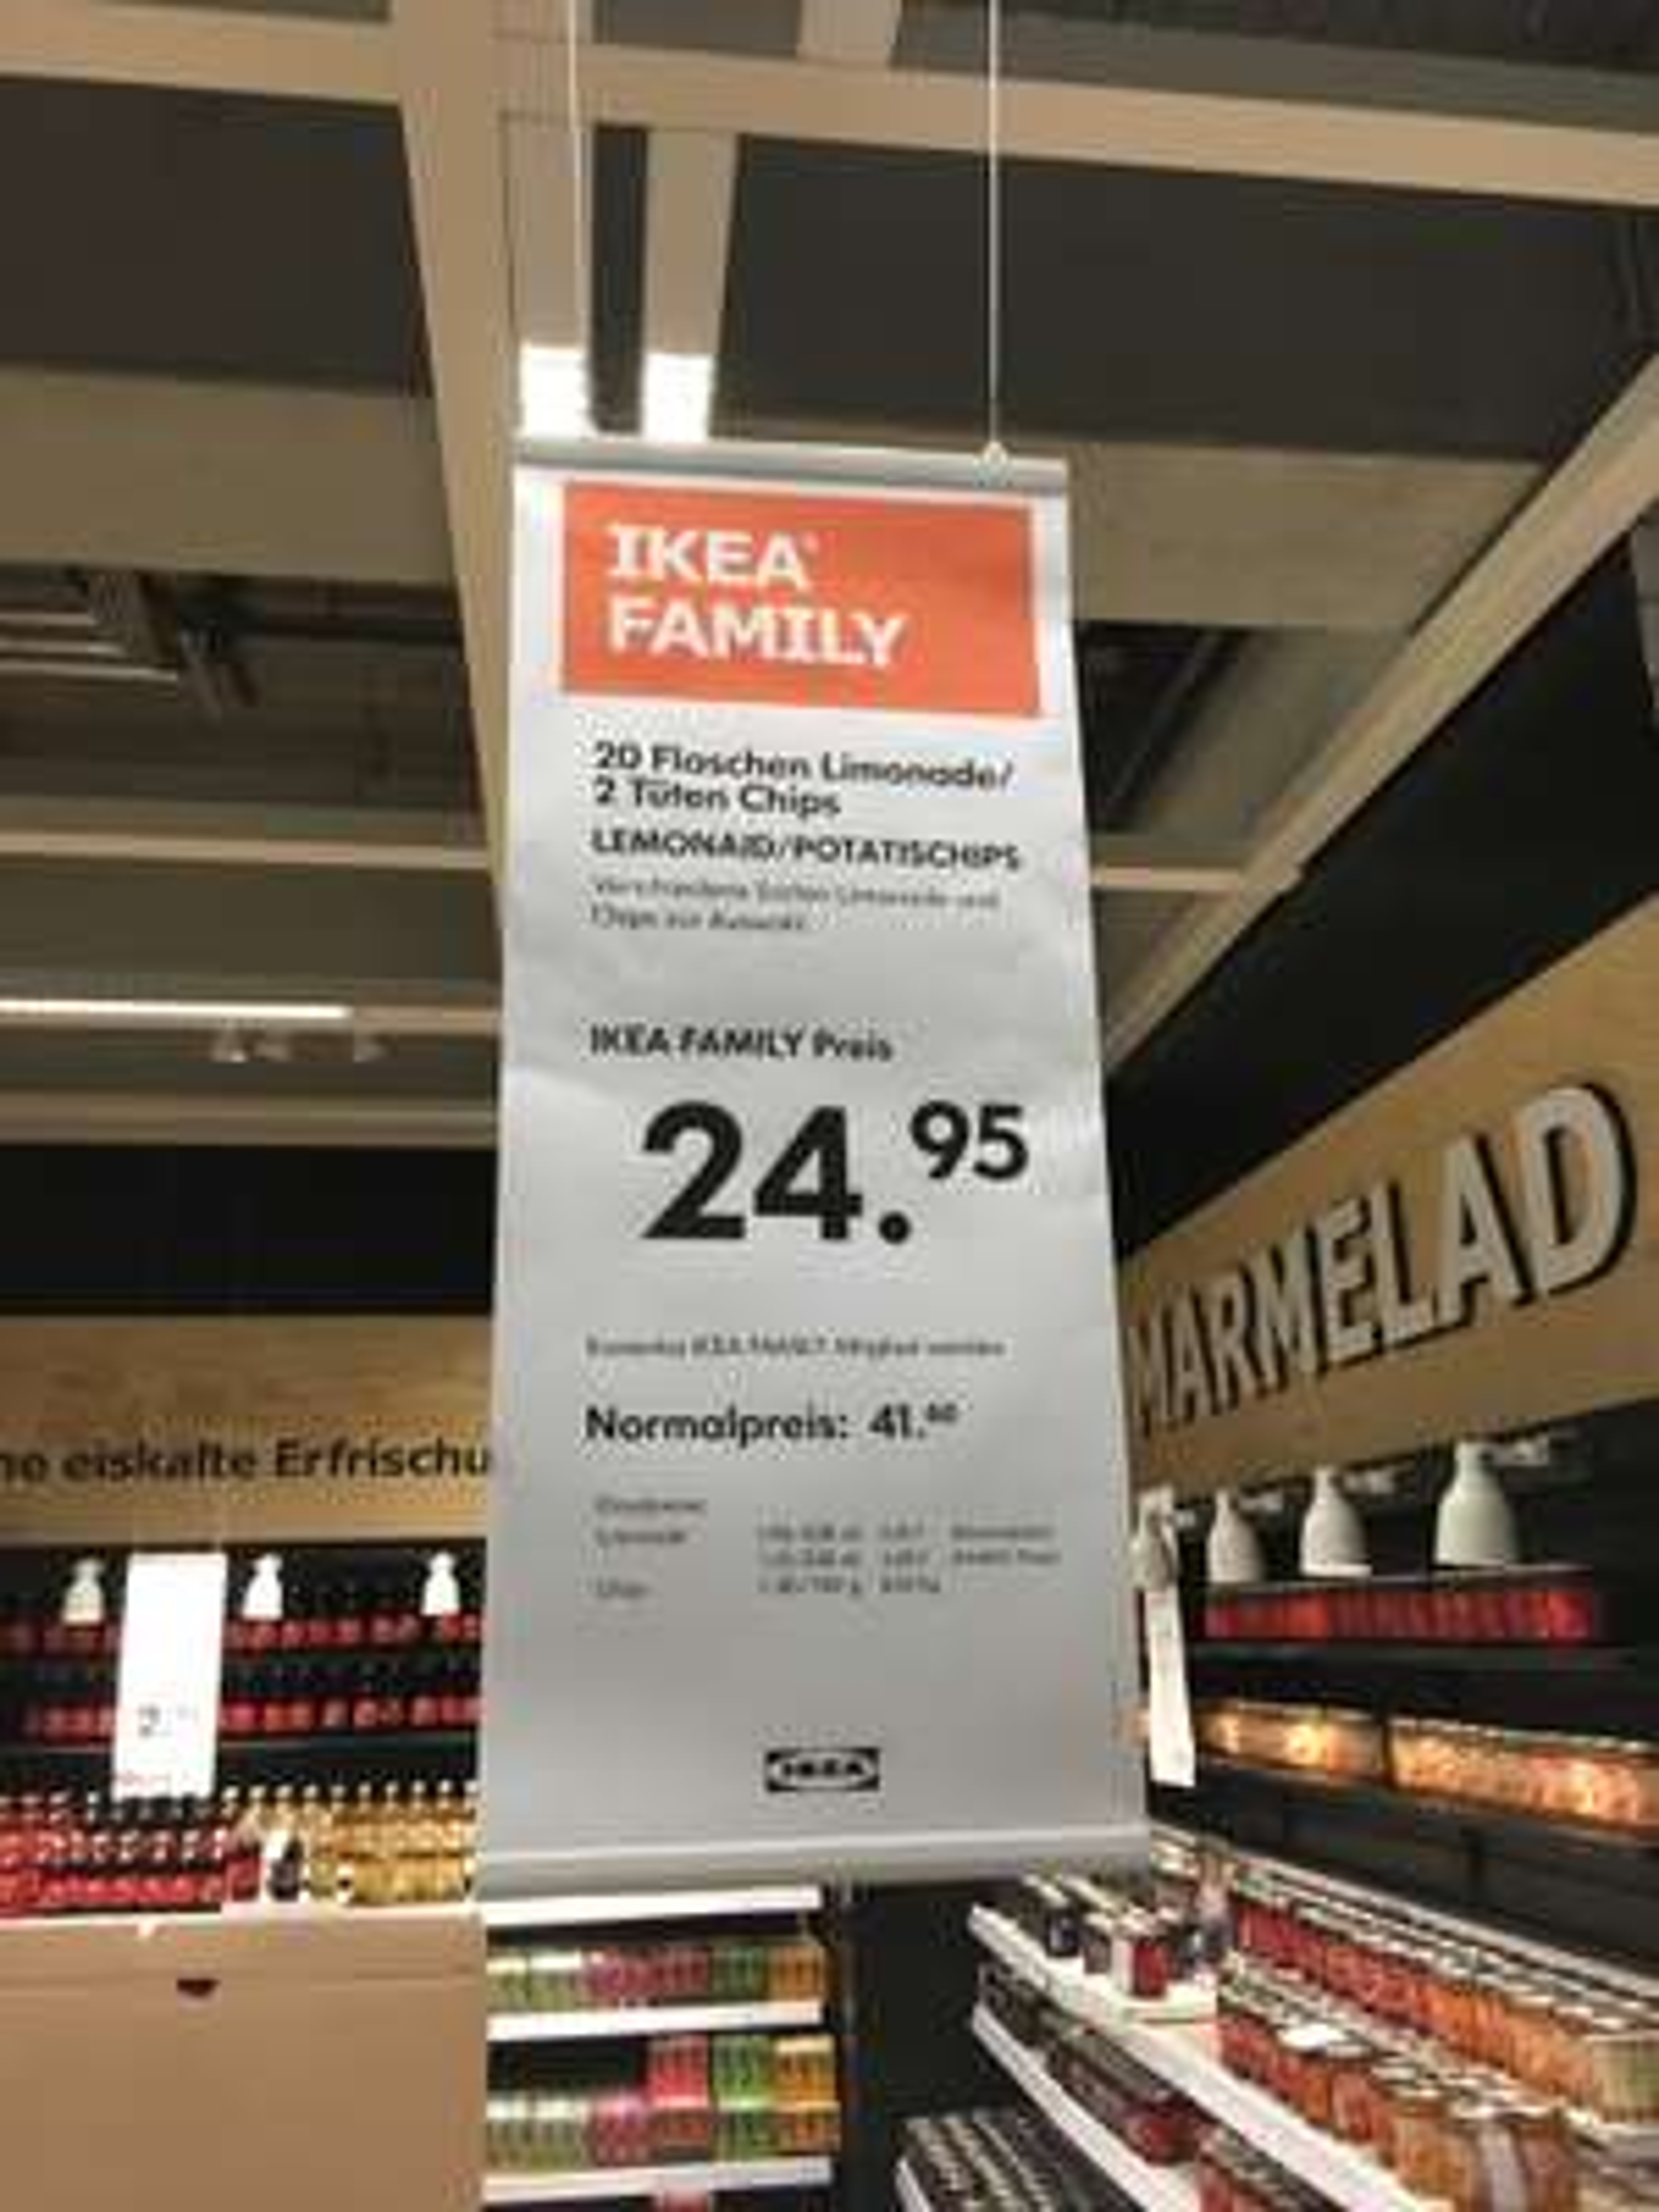 [IKEA Family Berlin] 20x ChariTea/Lemonaid + 2x Chips und OHNE Pfand-Berechnung